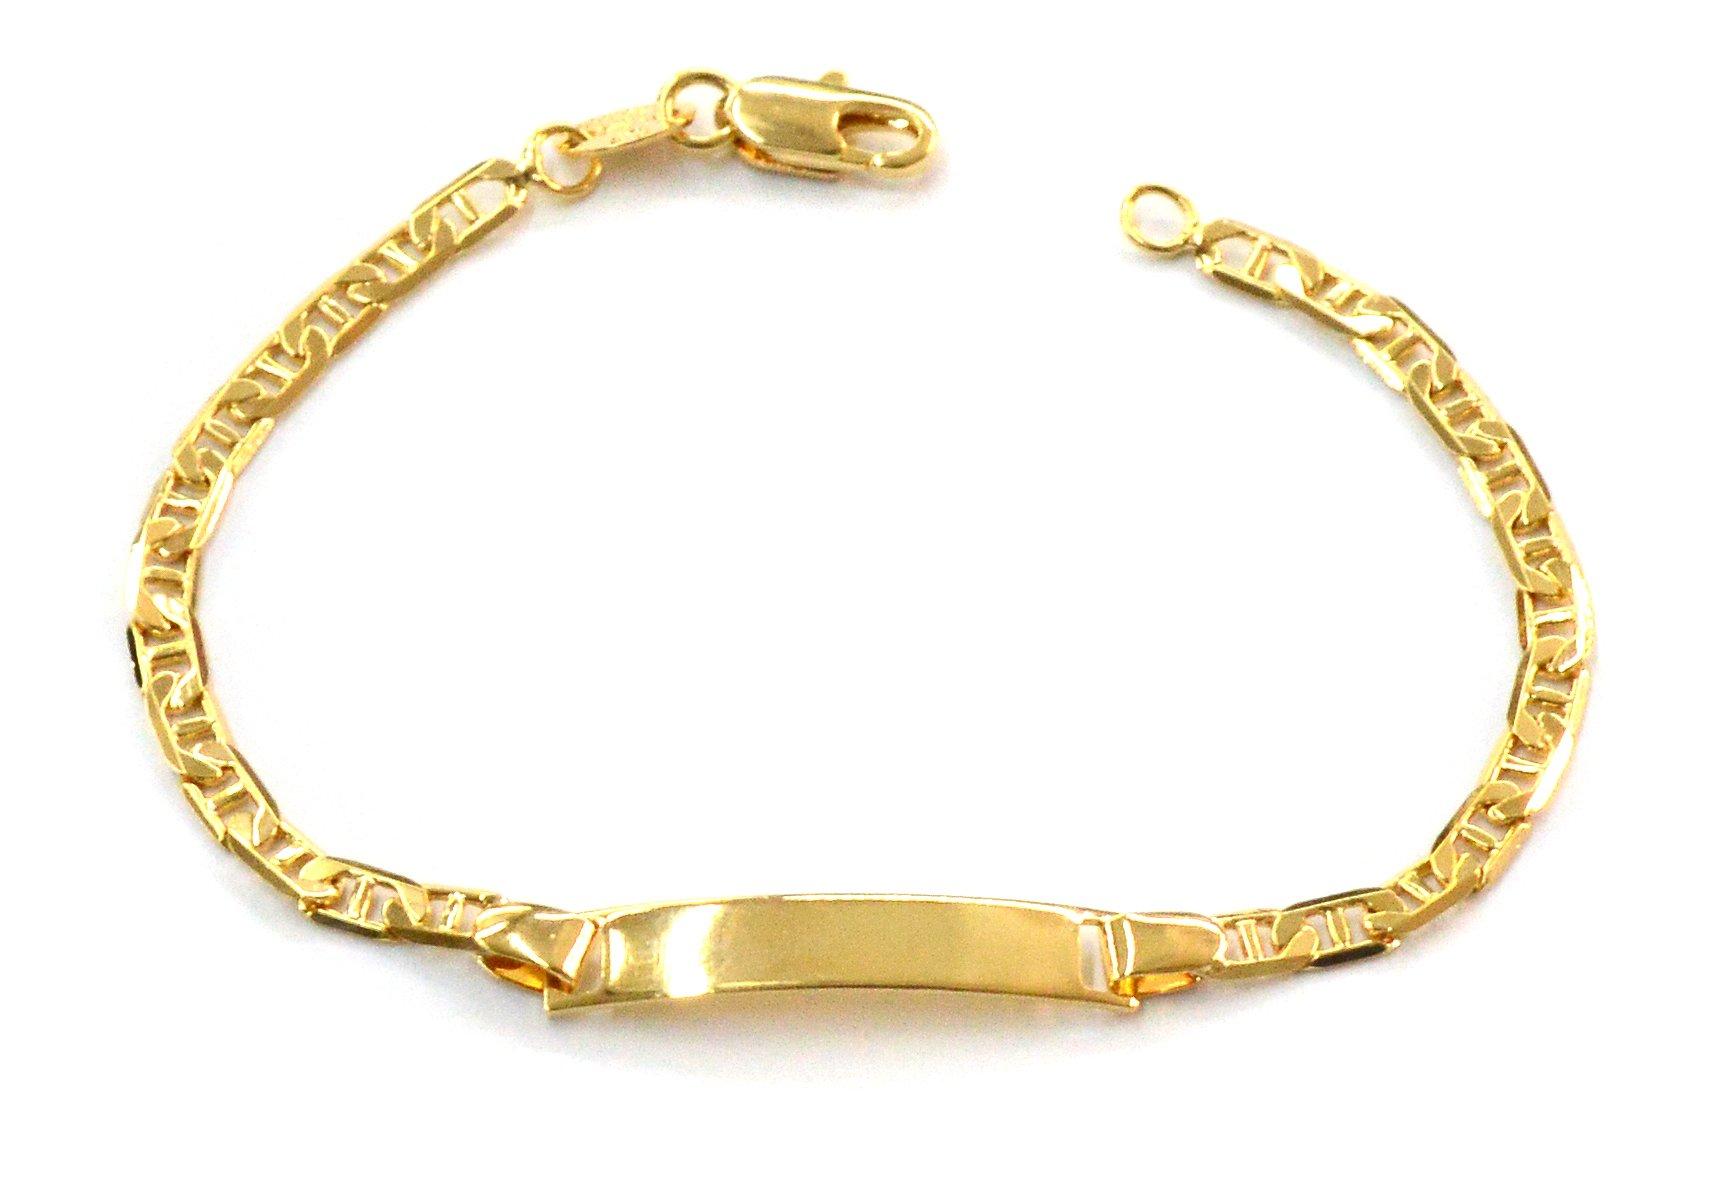 mbra-0516-j5 6.5 18kt Brazilian Gold Filled Kids ID Bracelet